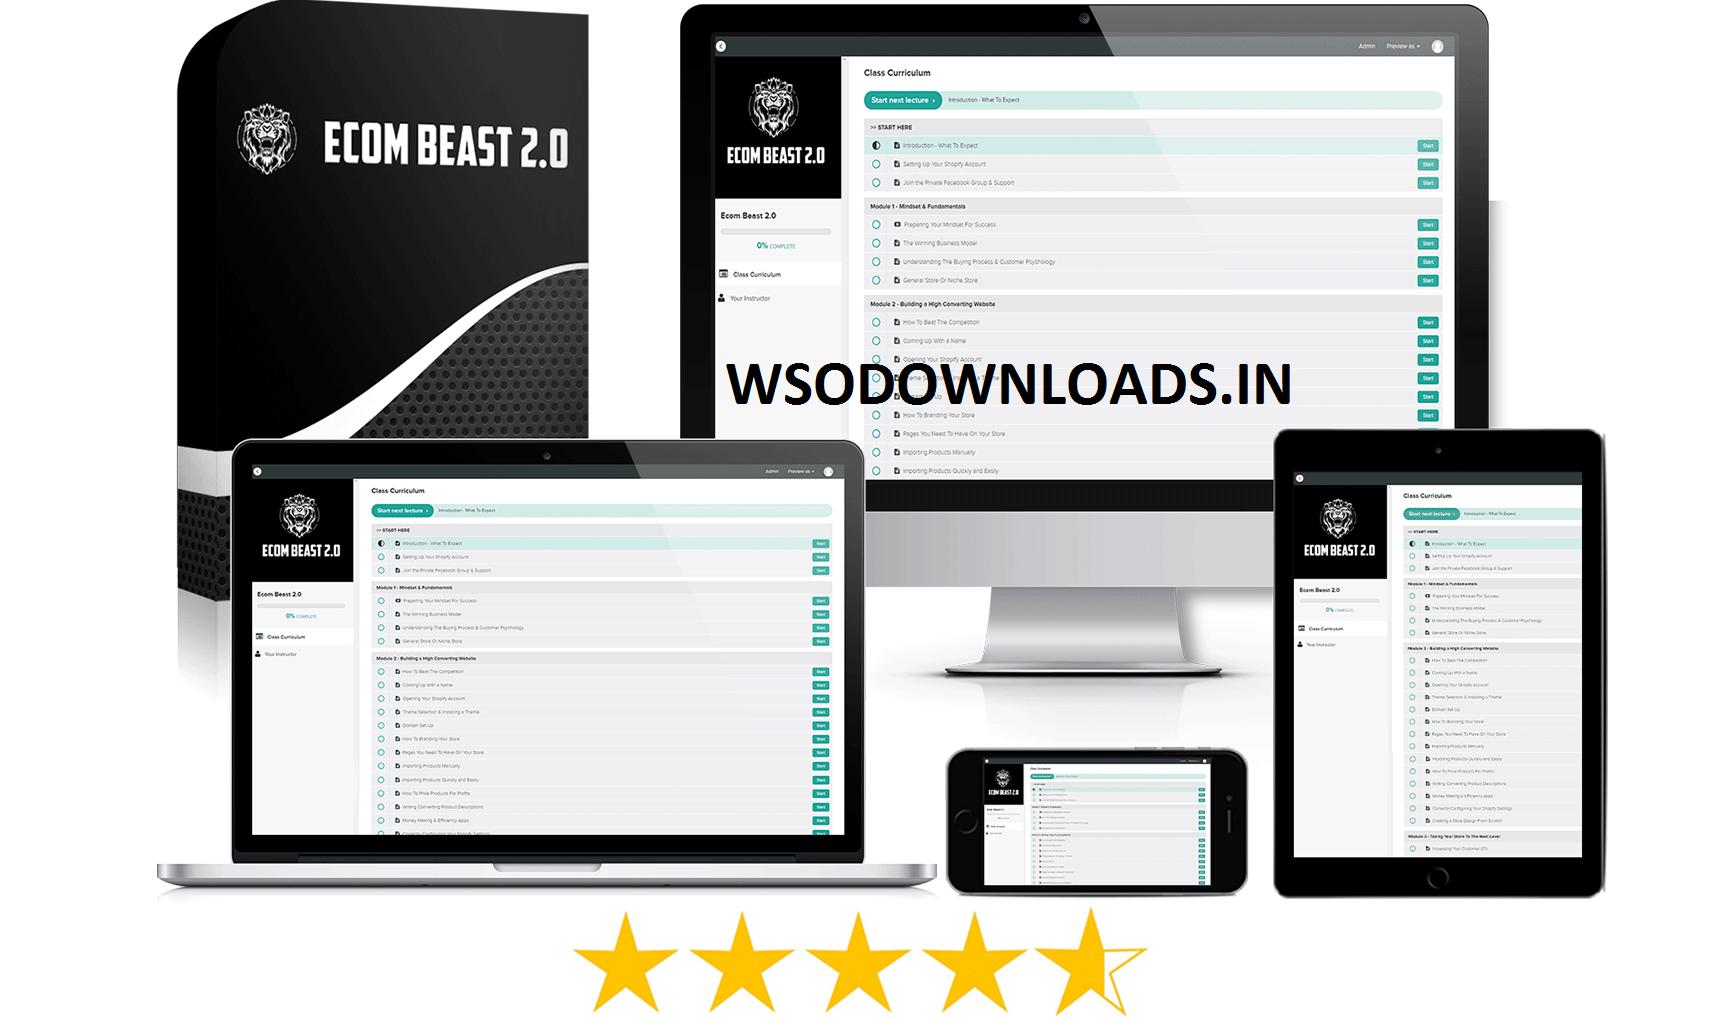 Harry Coleman Ecom Beast 2.0 - V3 Download